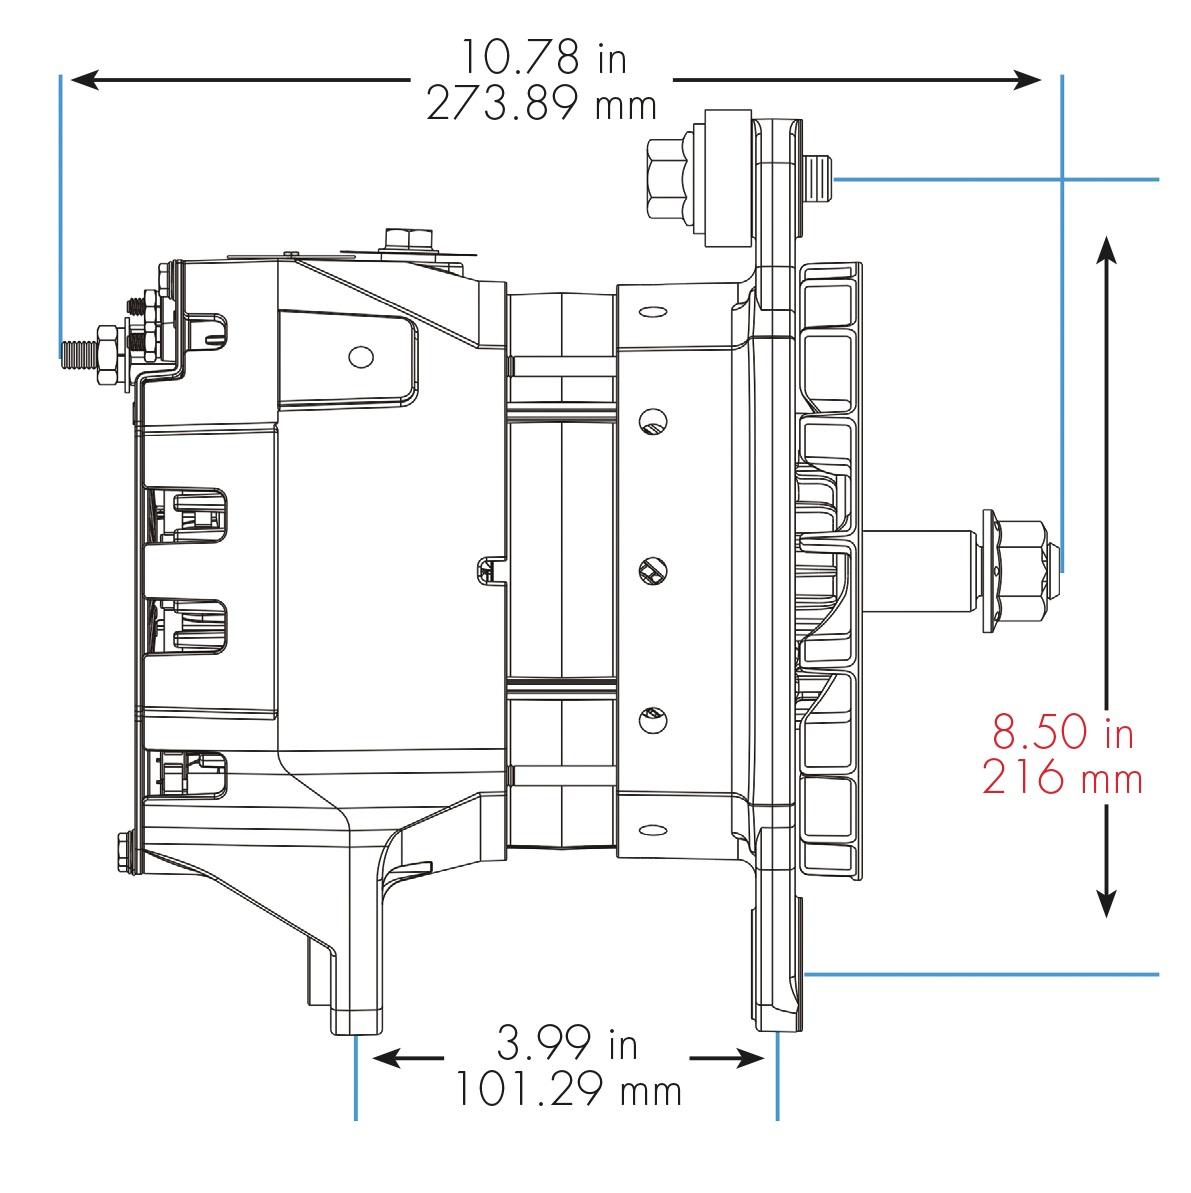 small resolution of 22si alternator wiring diagram identify diagram alternator wiringdelco remy si alternator wiring diagram wiring diagram alternators